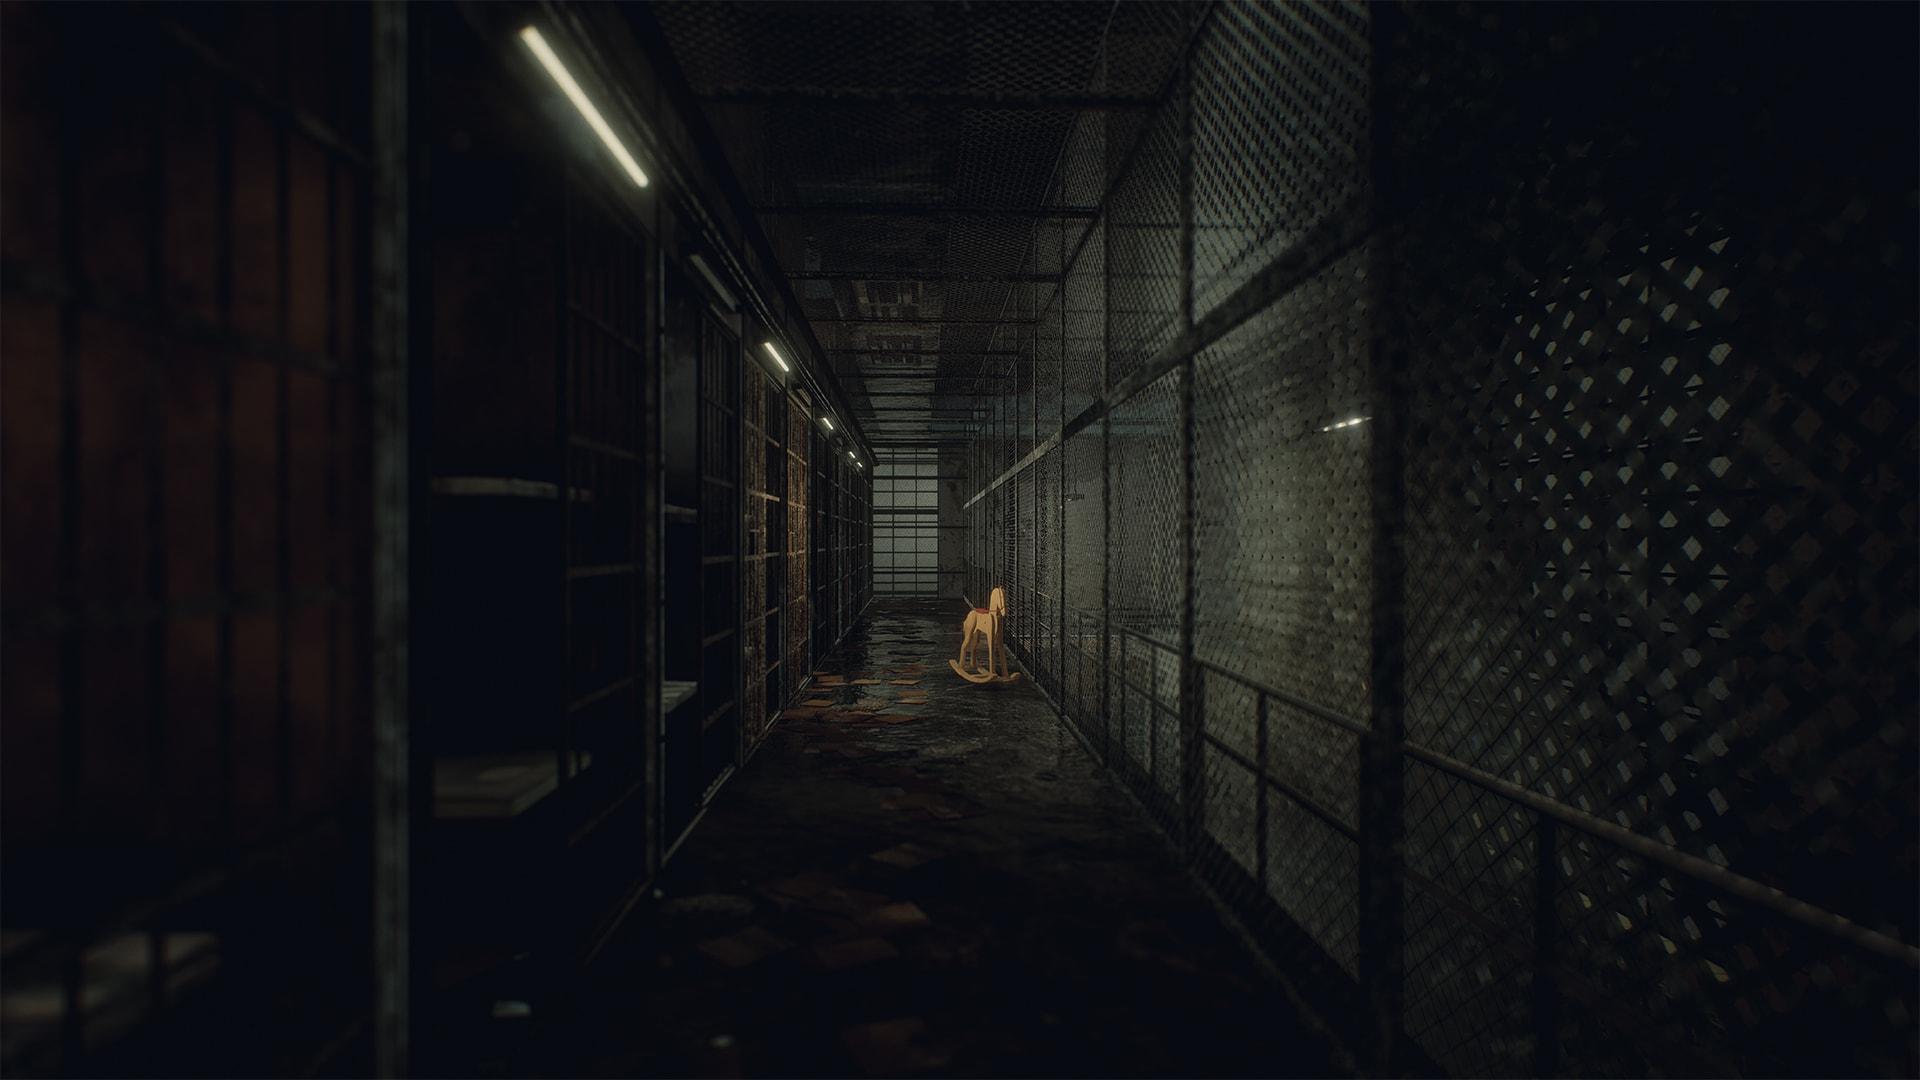 Review: Inmates